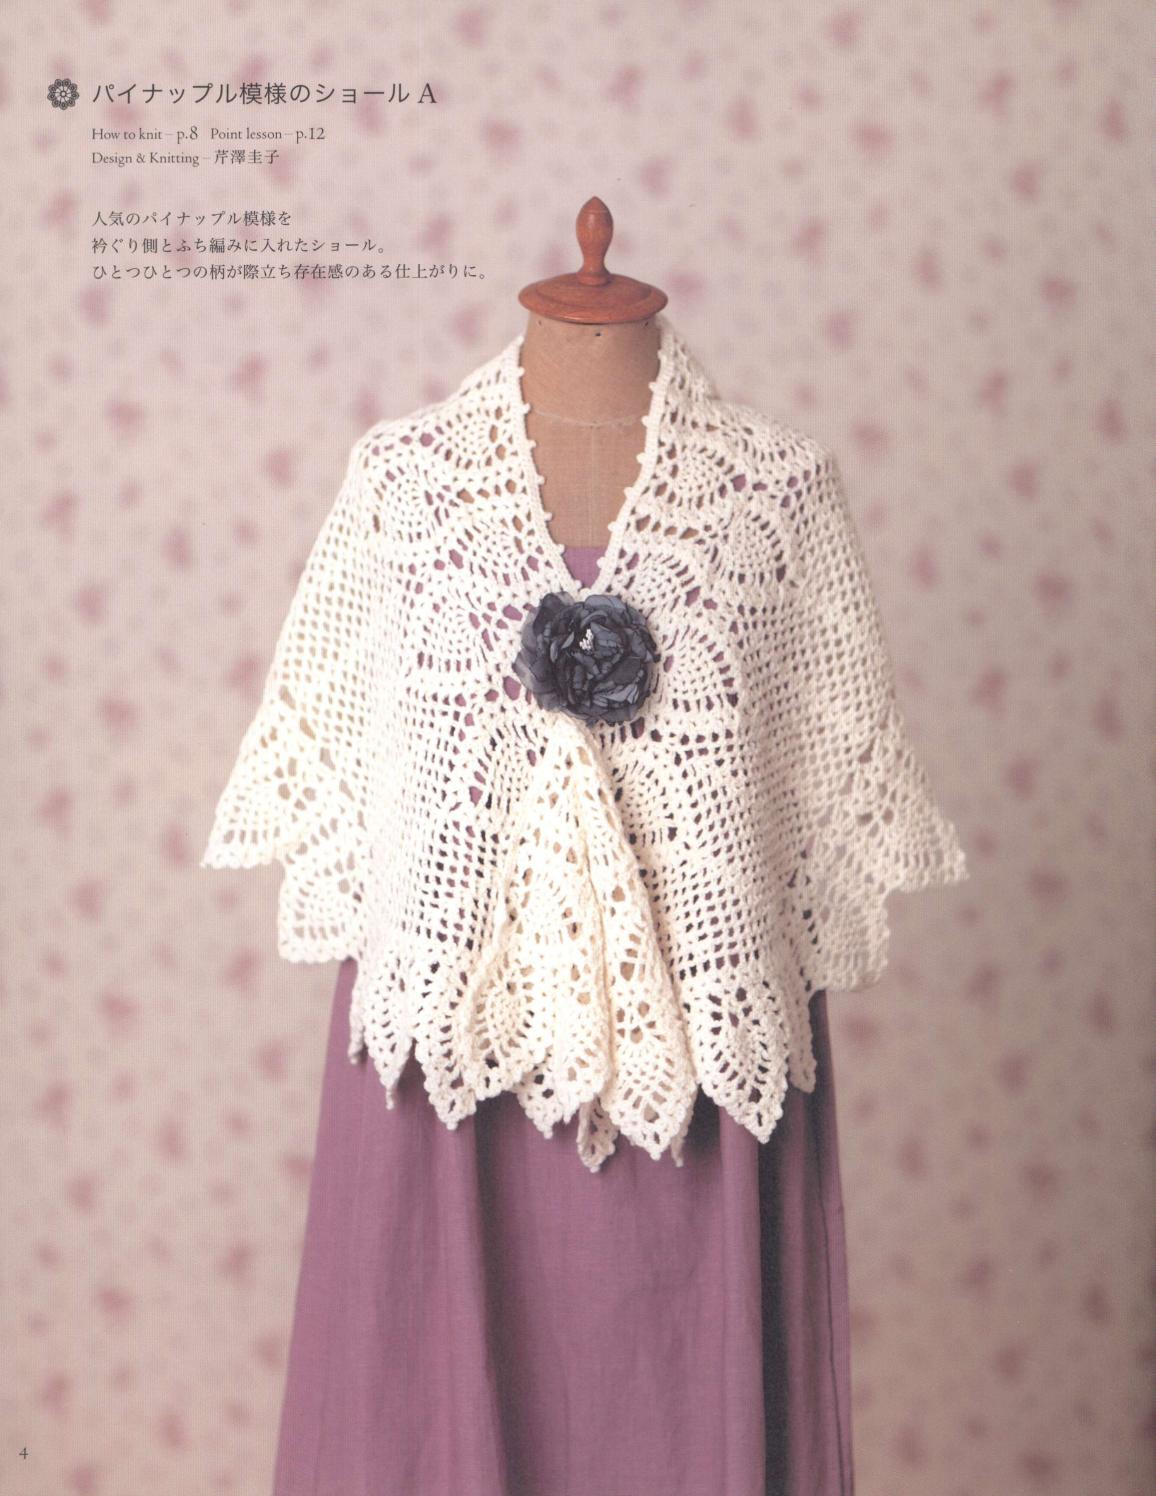 Asahi original crochet best selection 2012 page 4